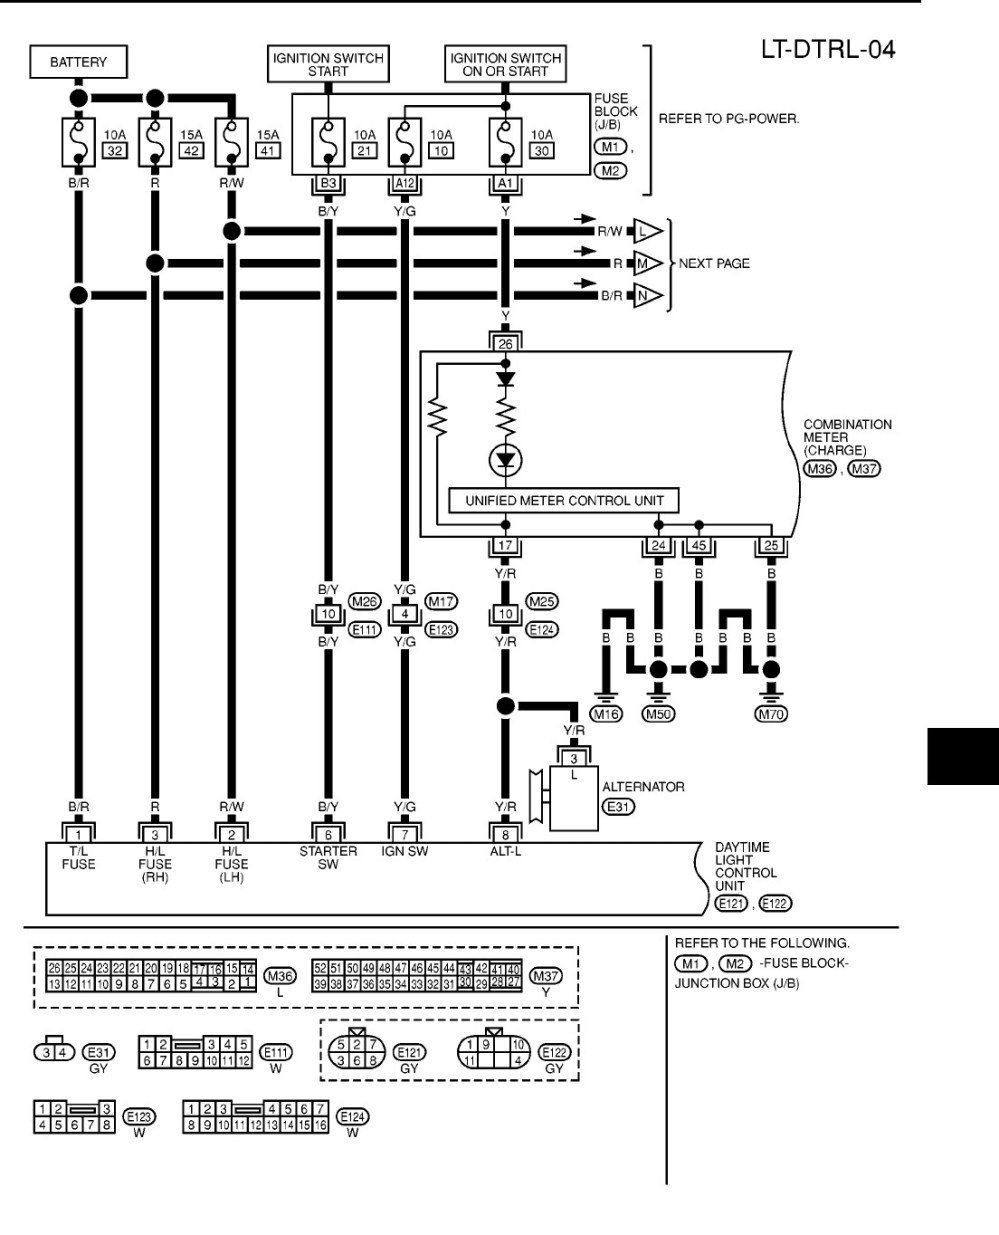 medium resolution of m55 wiring diagram wiring diagram load m52 wiring diagram m37 wiring diagram wiring diagram technic moffett